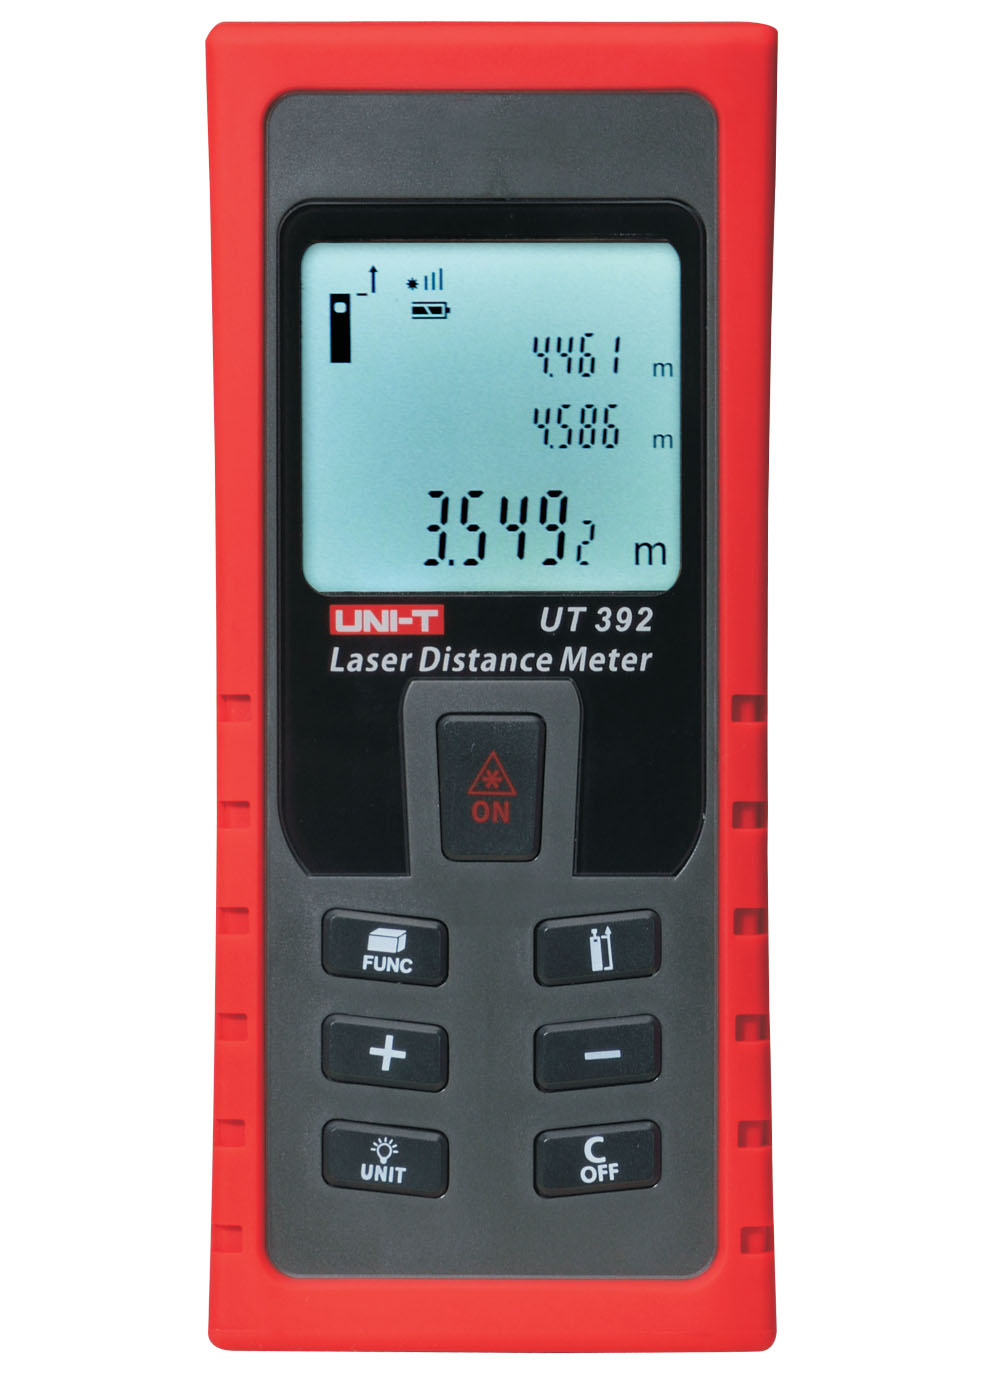 UNI-T UT392 - Laser Distance Meter Range: 80M